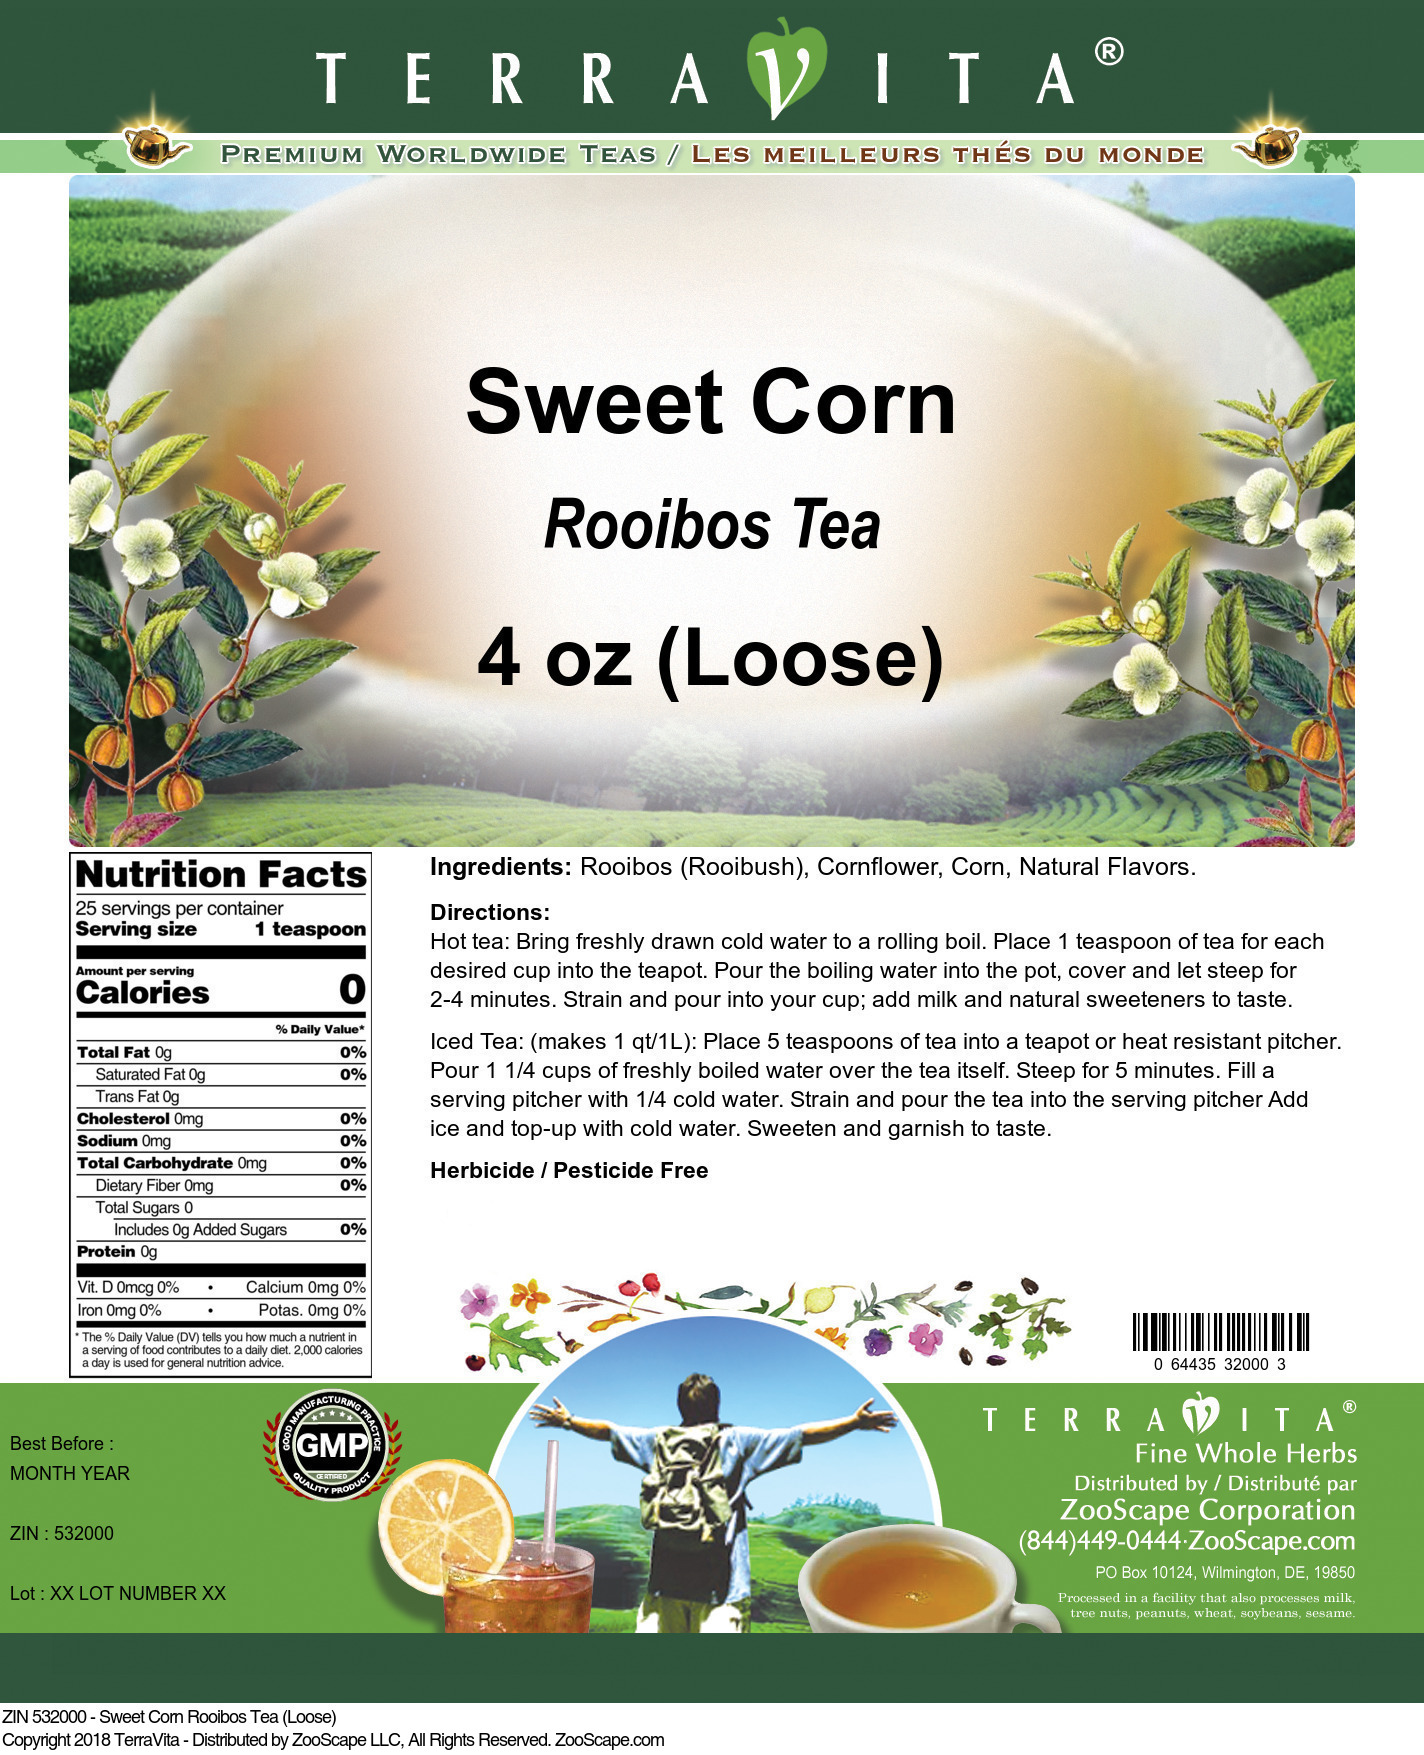 Sweet Corn Rooibos Tea (Loose)